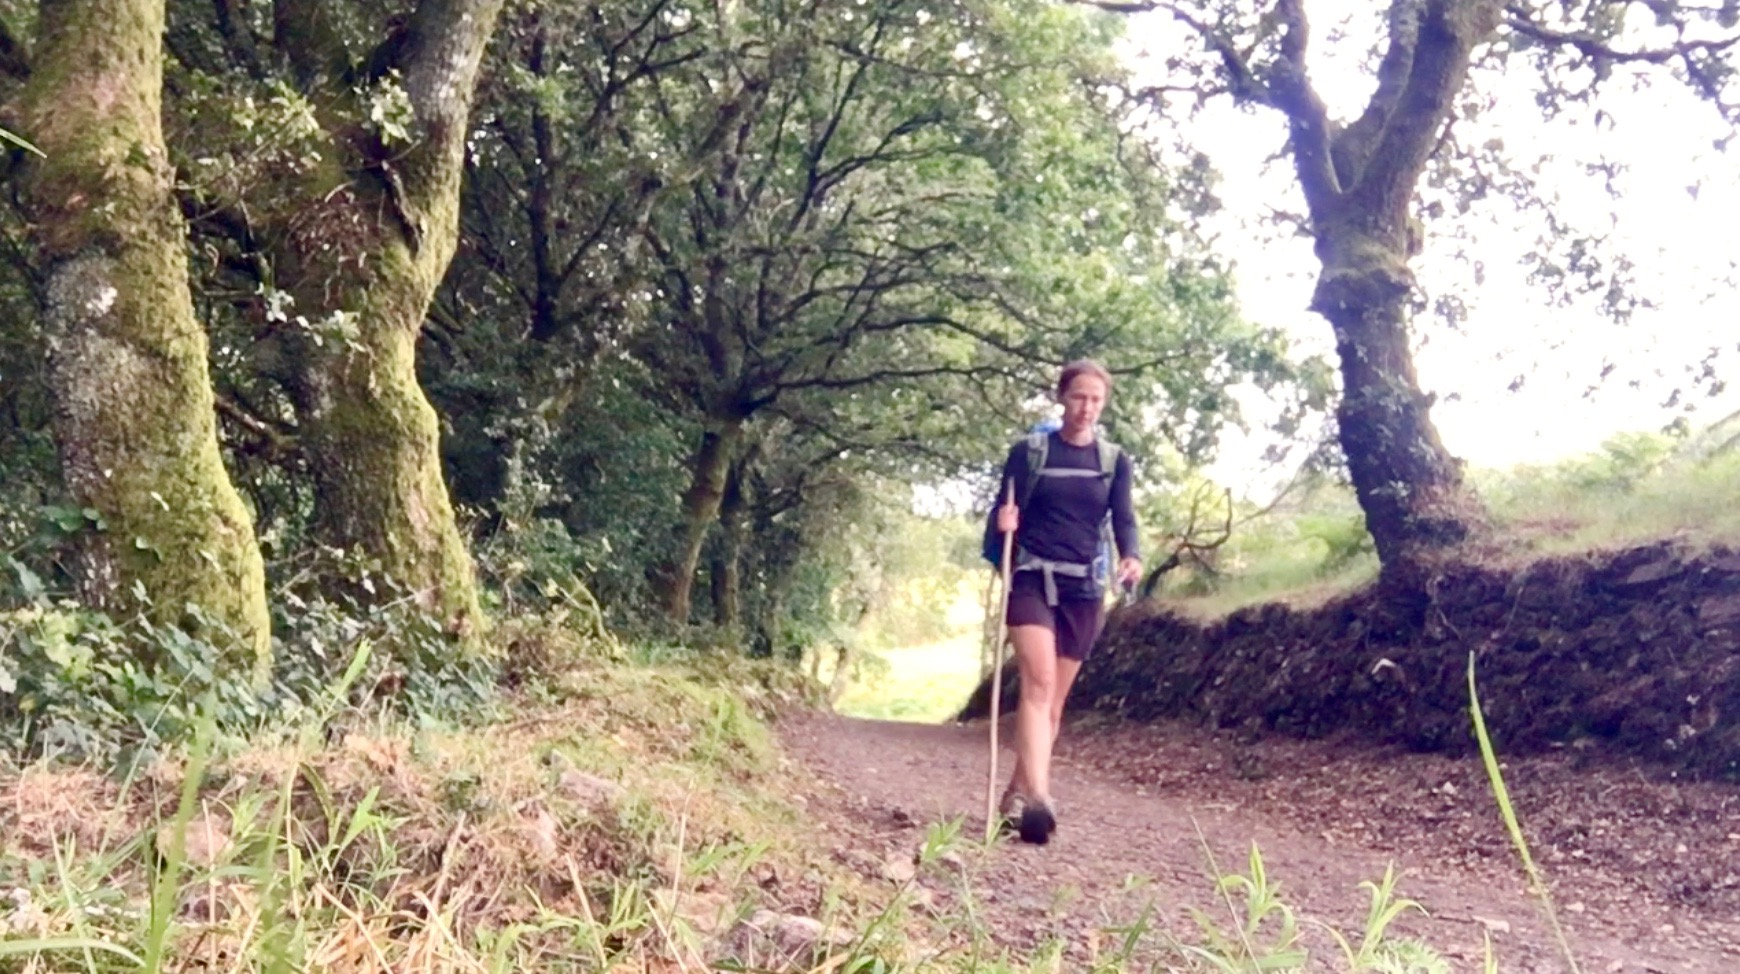 Walking the last kilometers of the Camino Primitivo